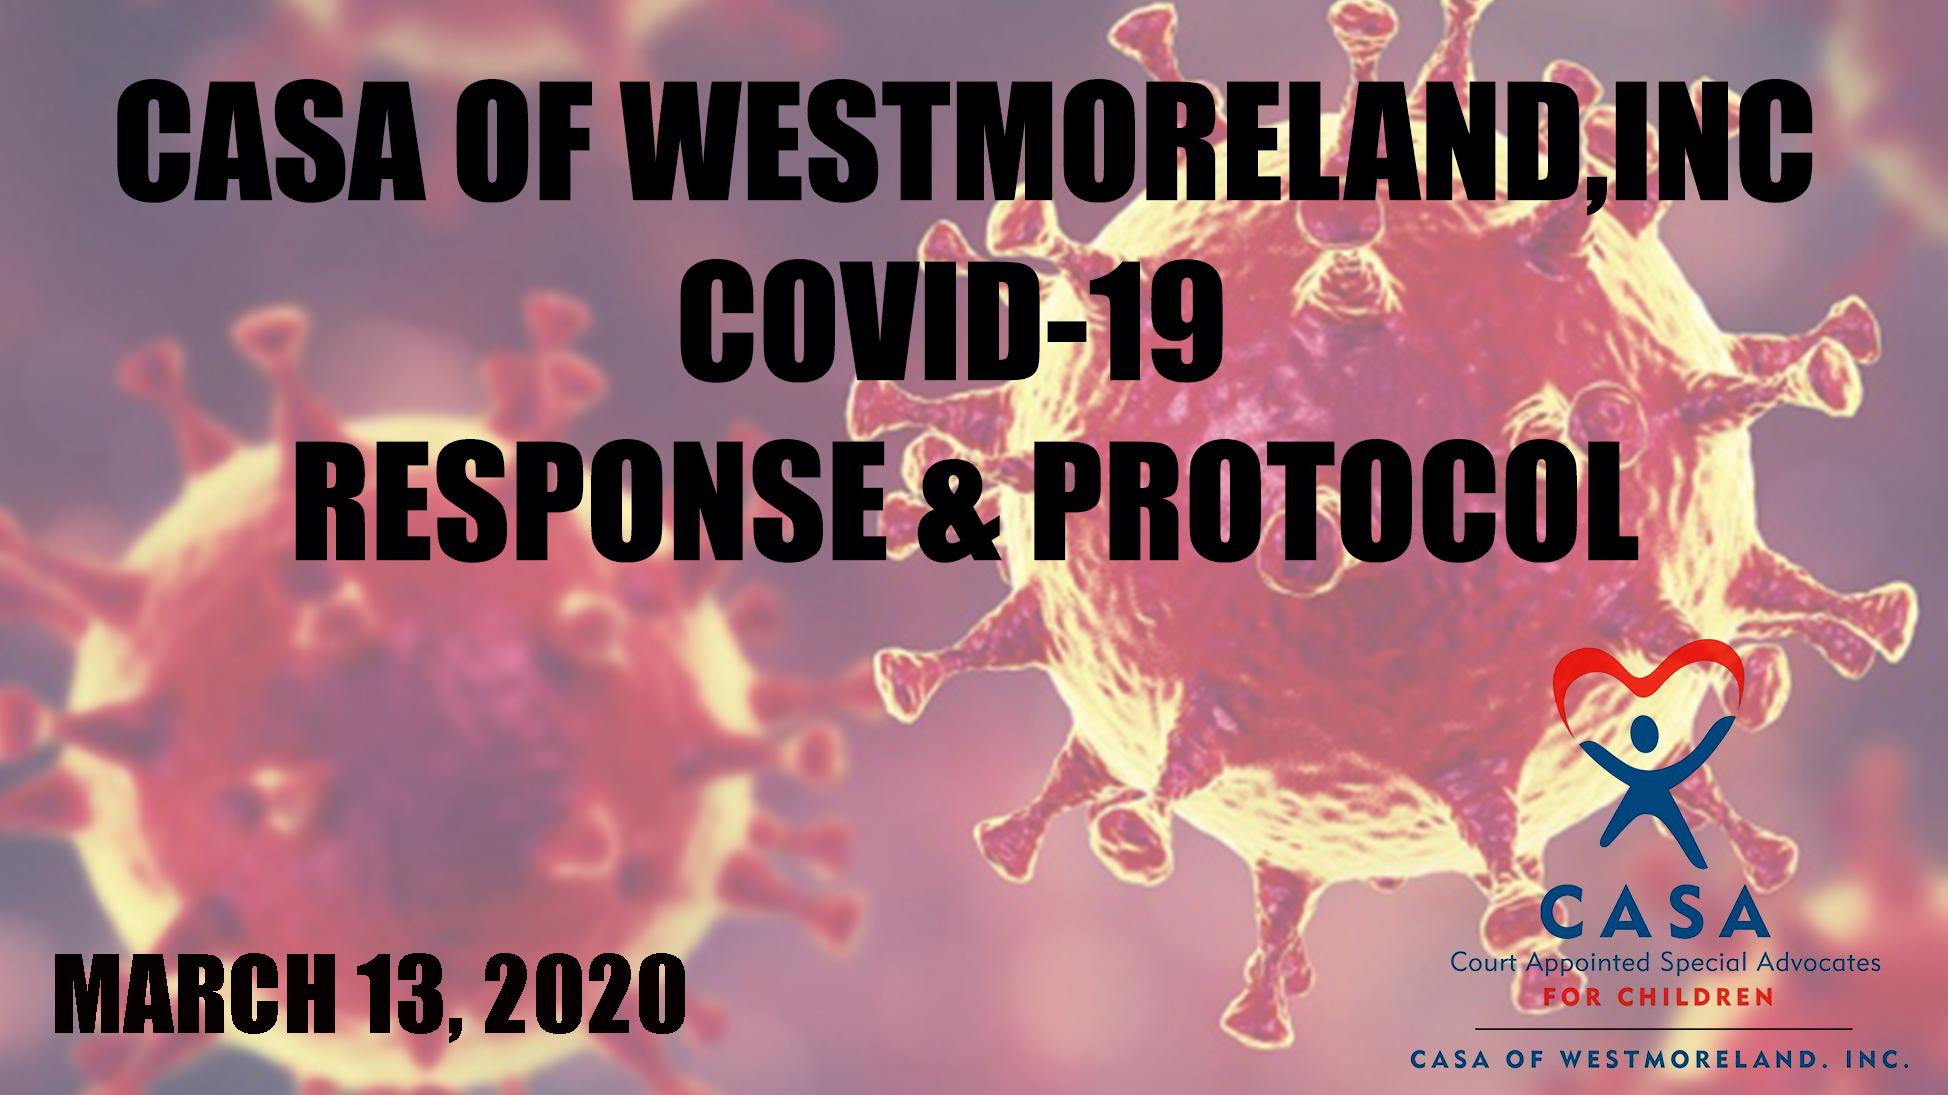 CASA Of Westmoreland, Inc. Covid-19 Response And Protocols